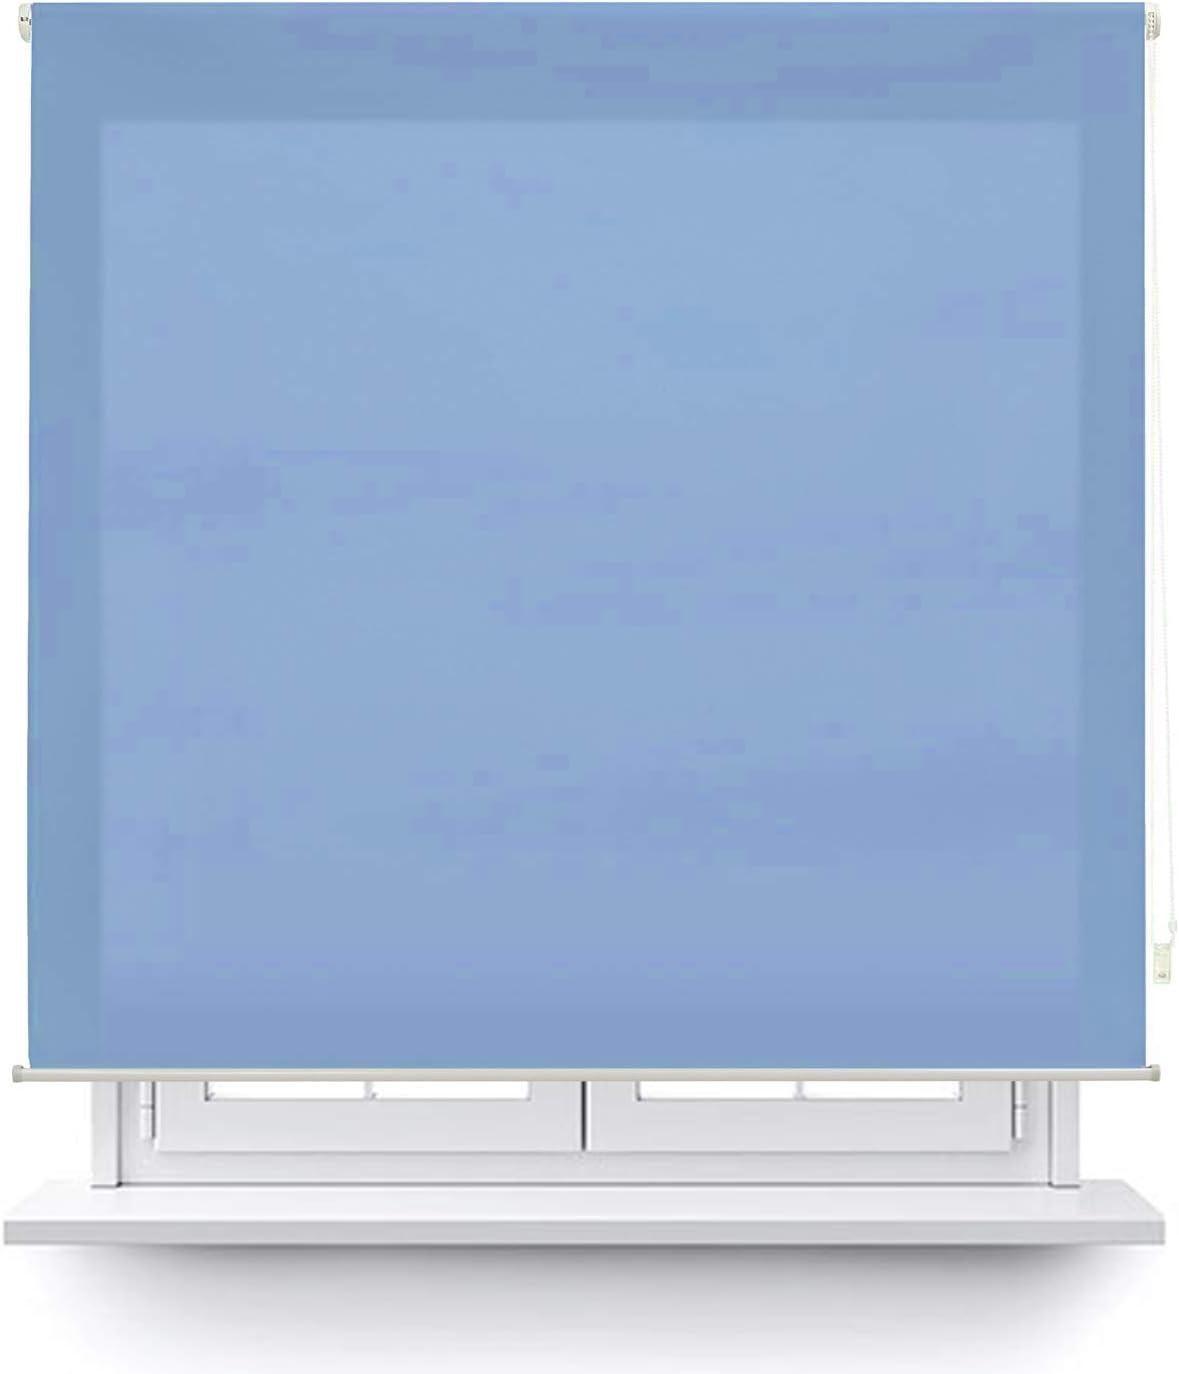 MERCURY TEXTIL Estor Enrollable translúcido Liso (Azul, 150x180cm)